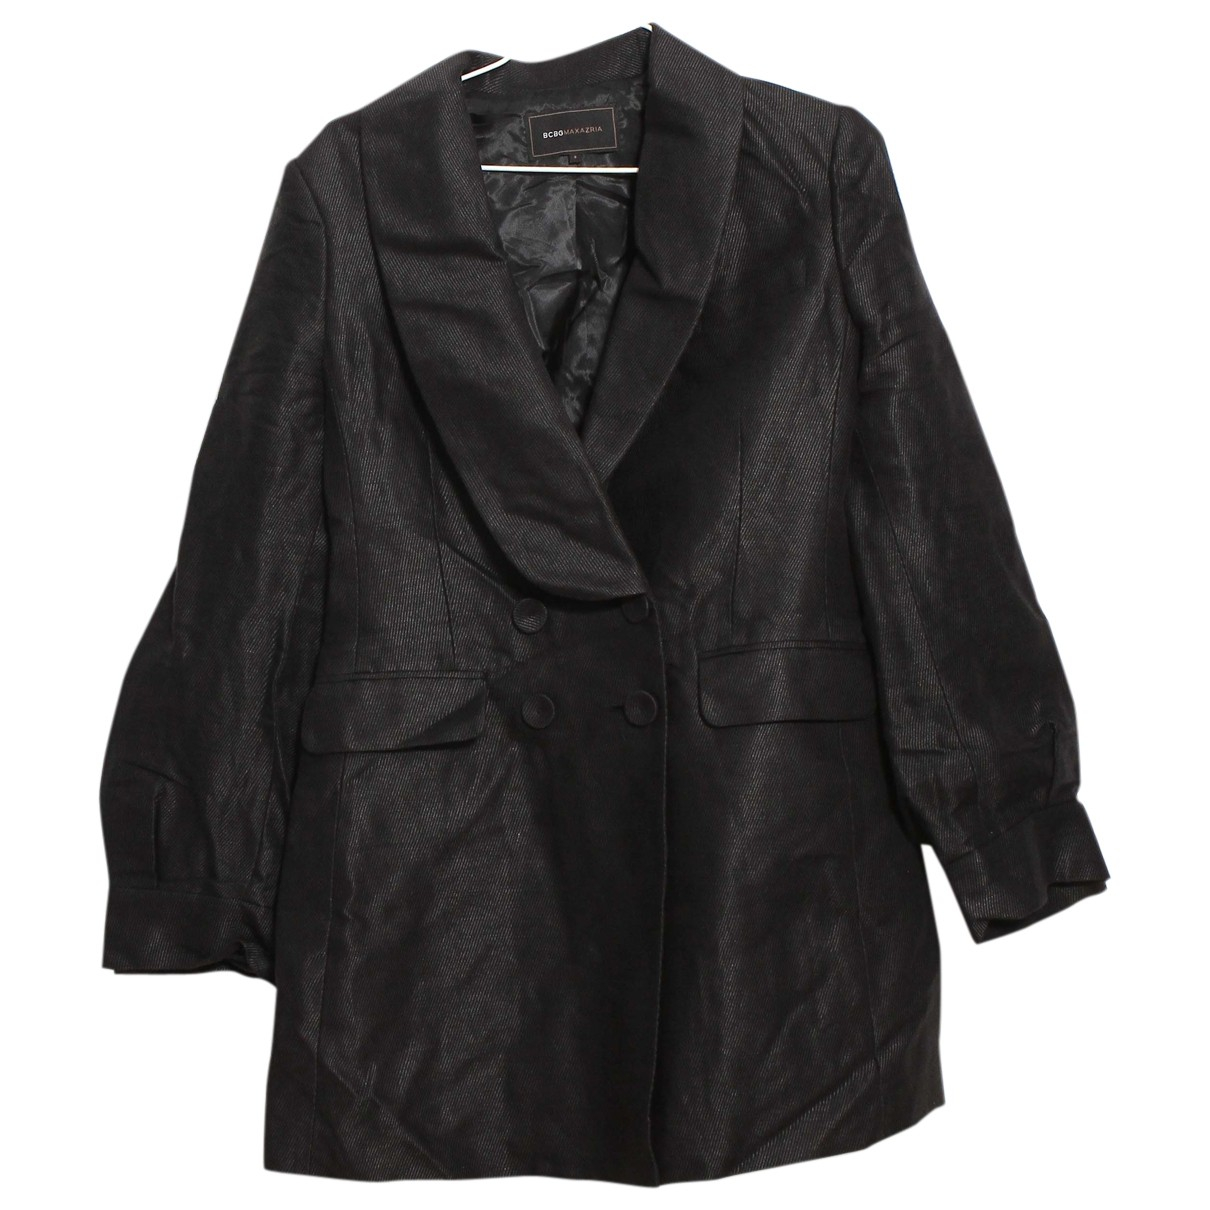 Bcbg Max Azria N Black Cotton jacket for Women S International